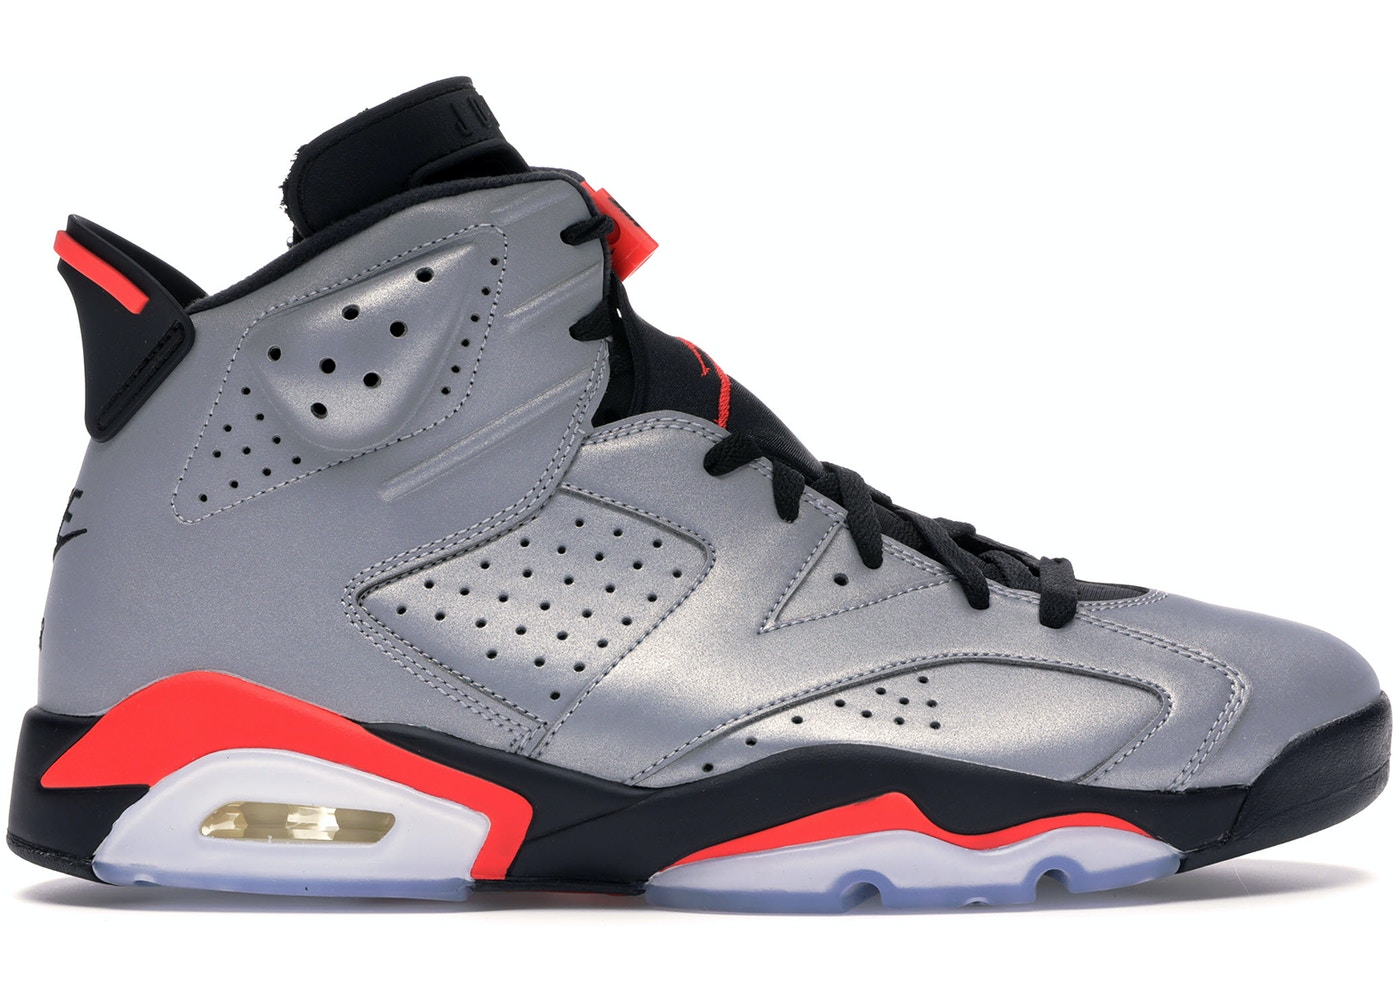 a6a45193937 Buy Air Jordan 6 Shoes & Deadstock Sneakers